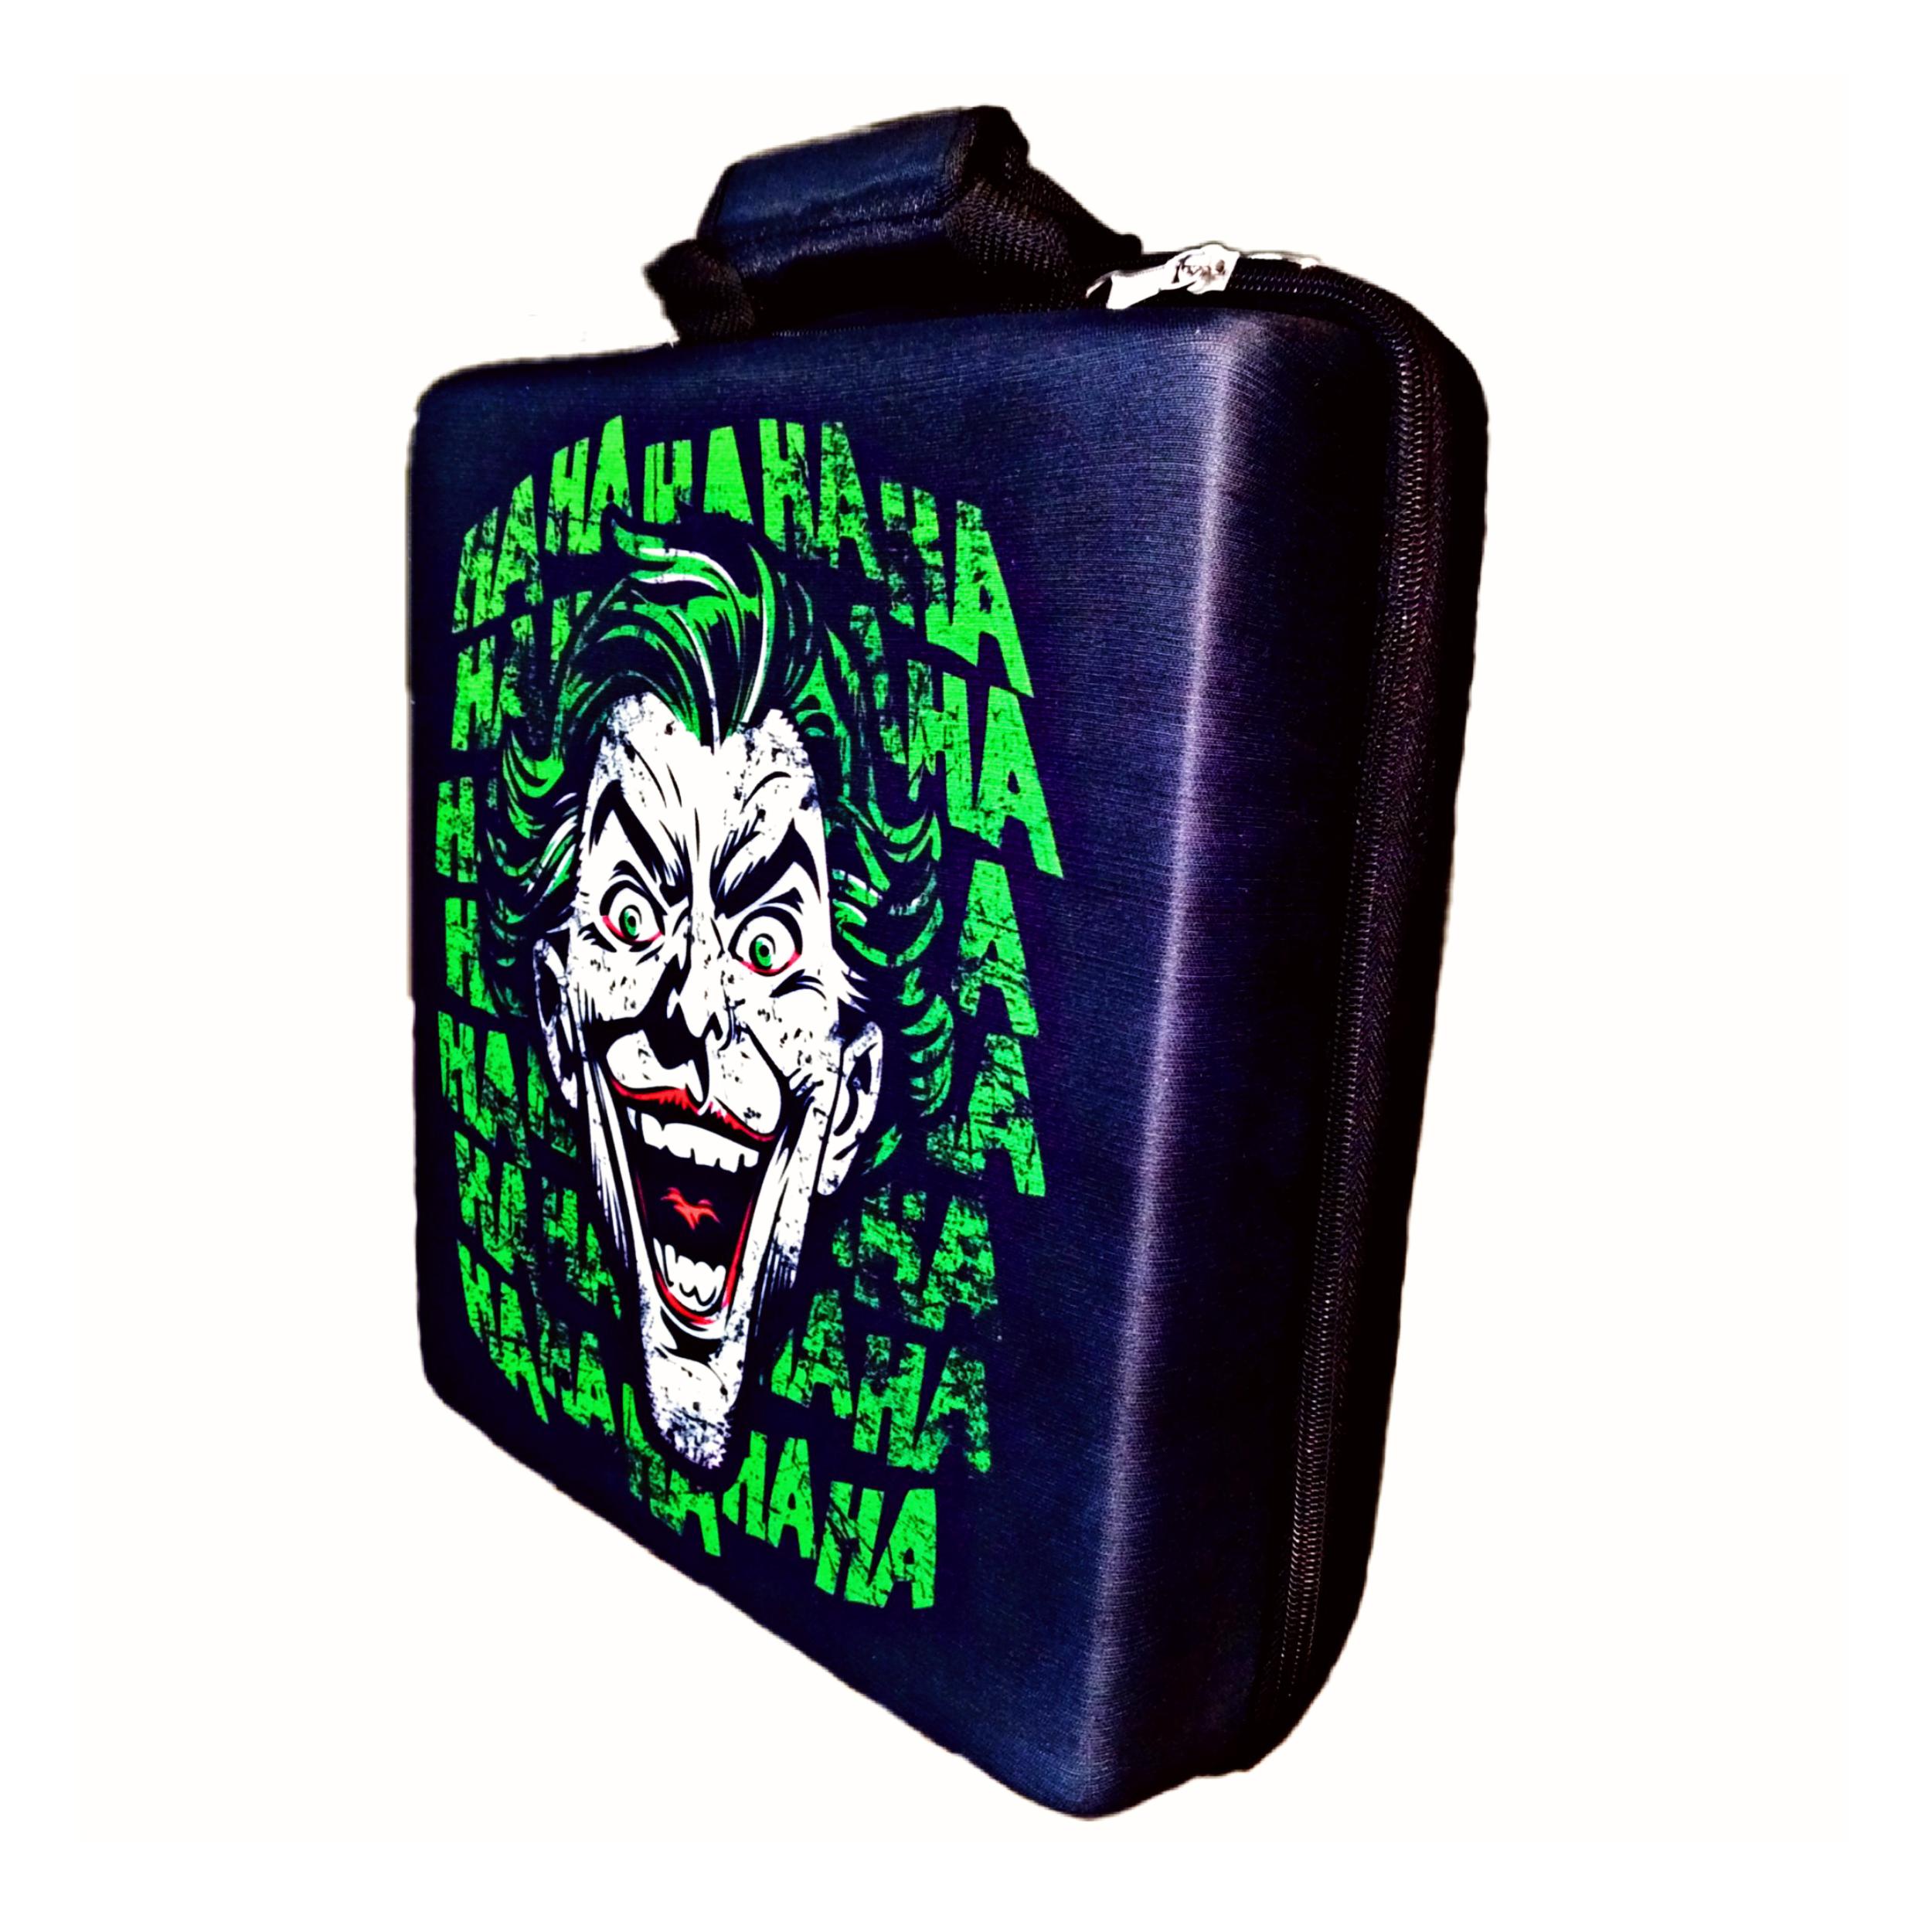 کیف حمل پلی استیشن ۴ مدل Joker کد ۱۰۱۴